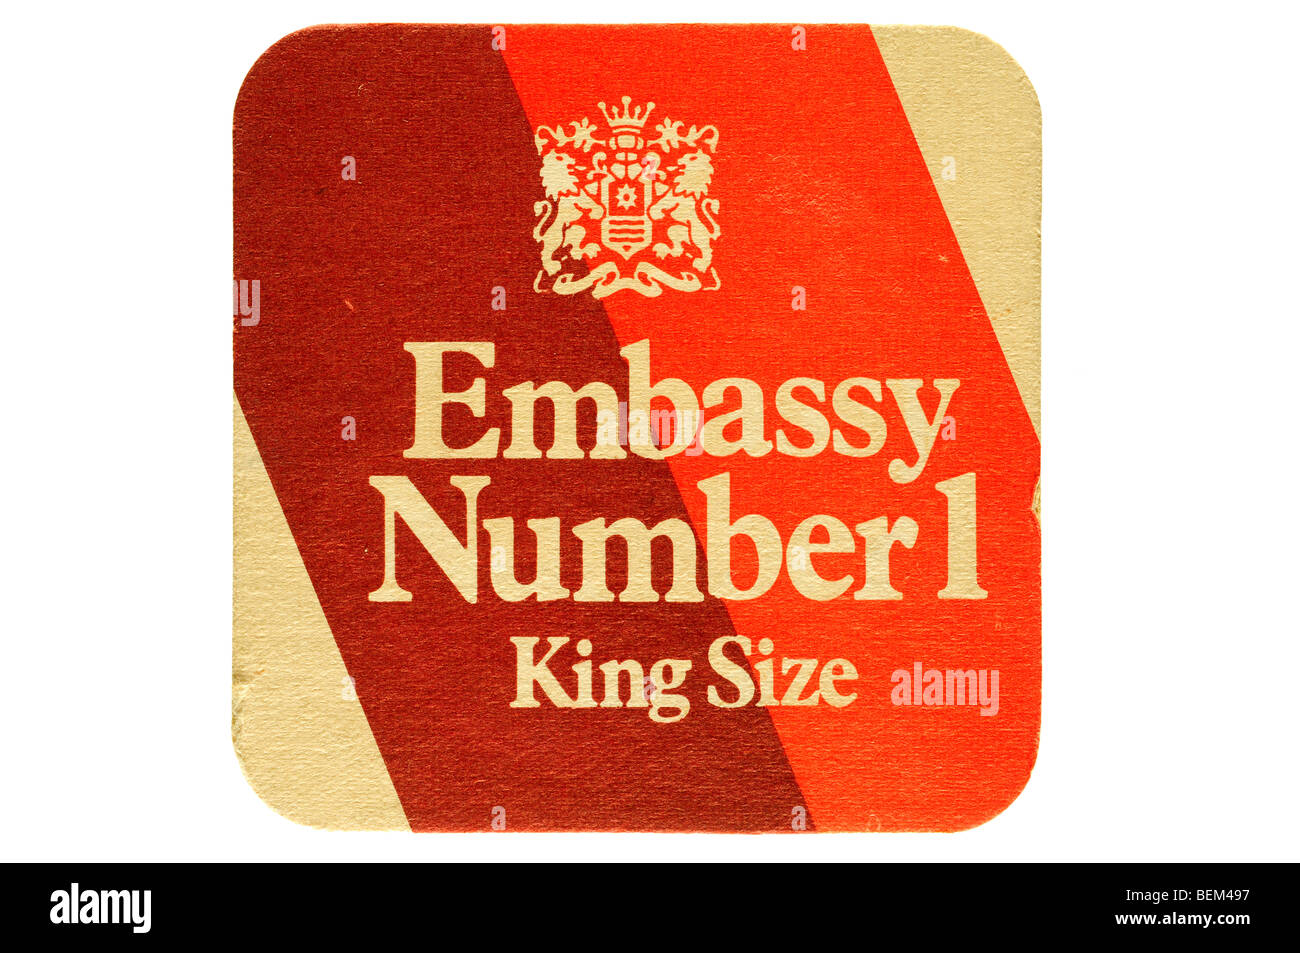 Embajada número 1 king size Imagen De Stock